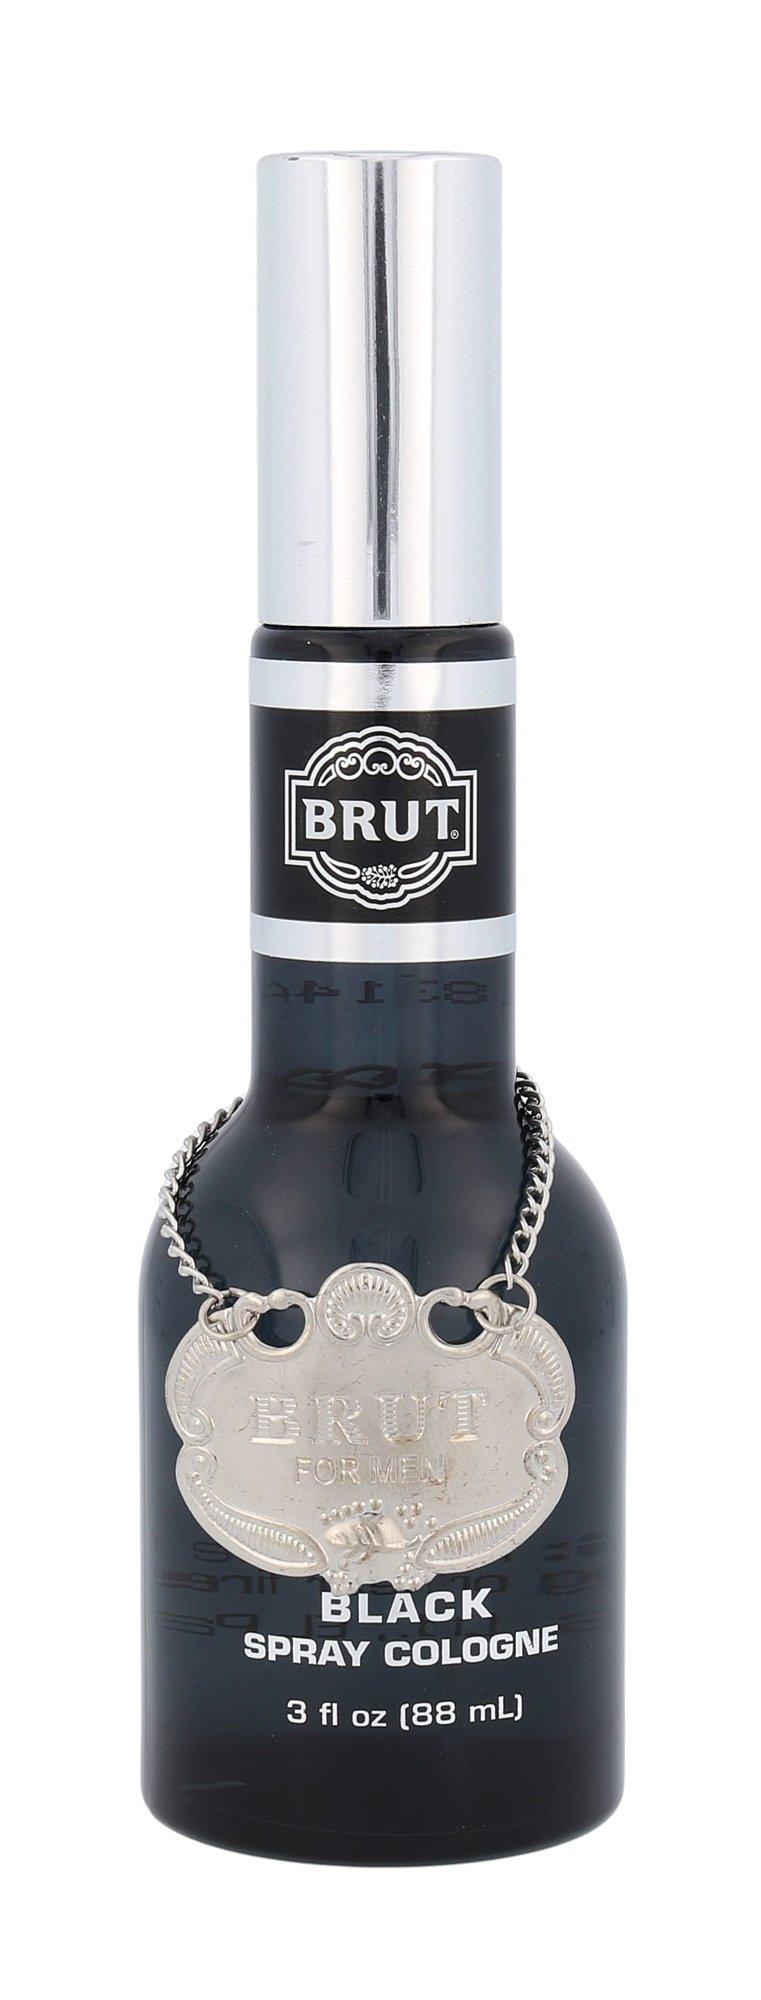 Odekolonai Brut Black